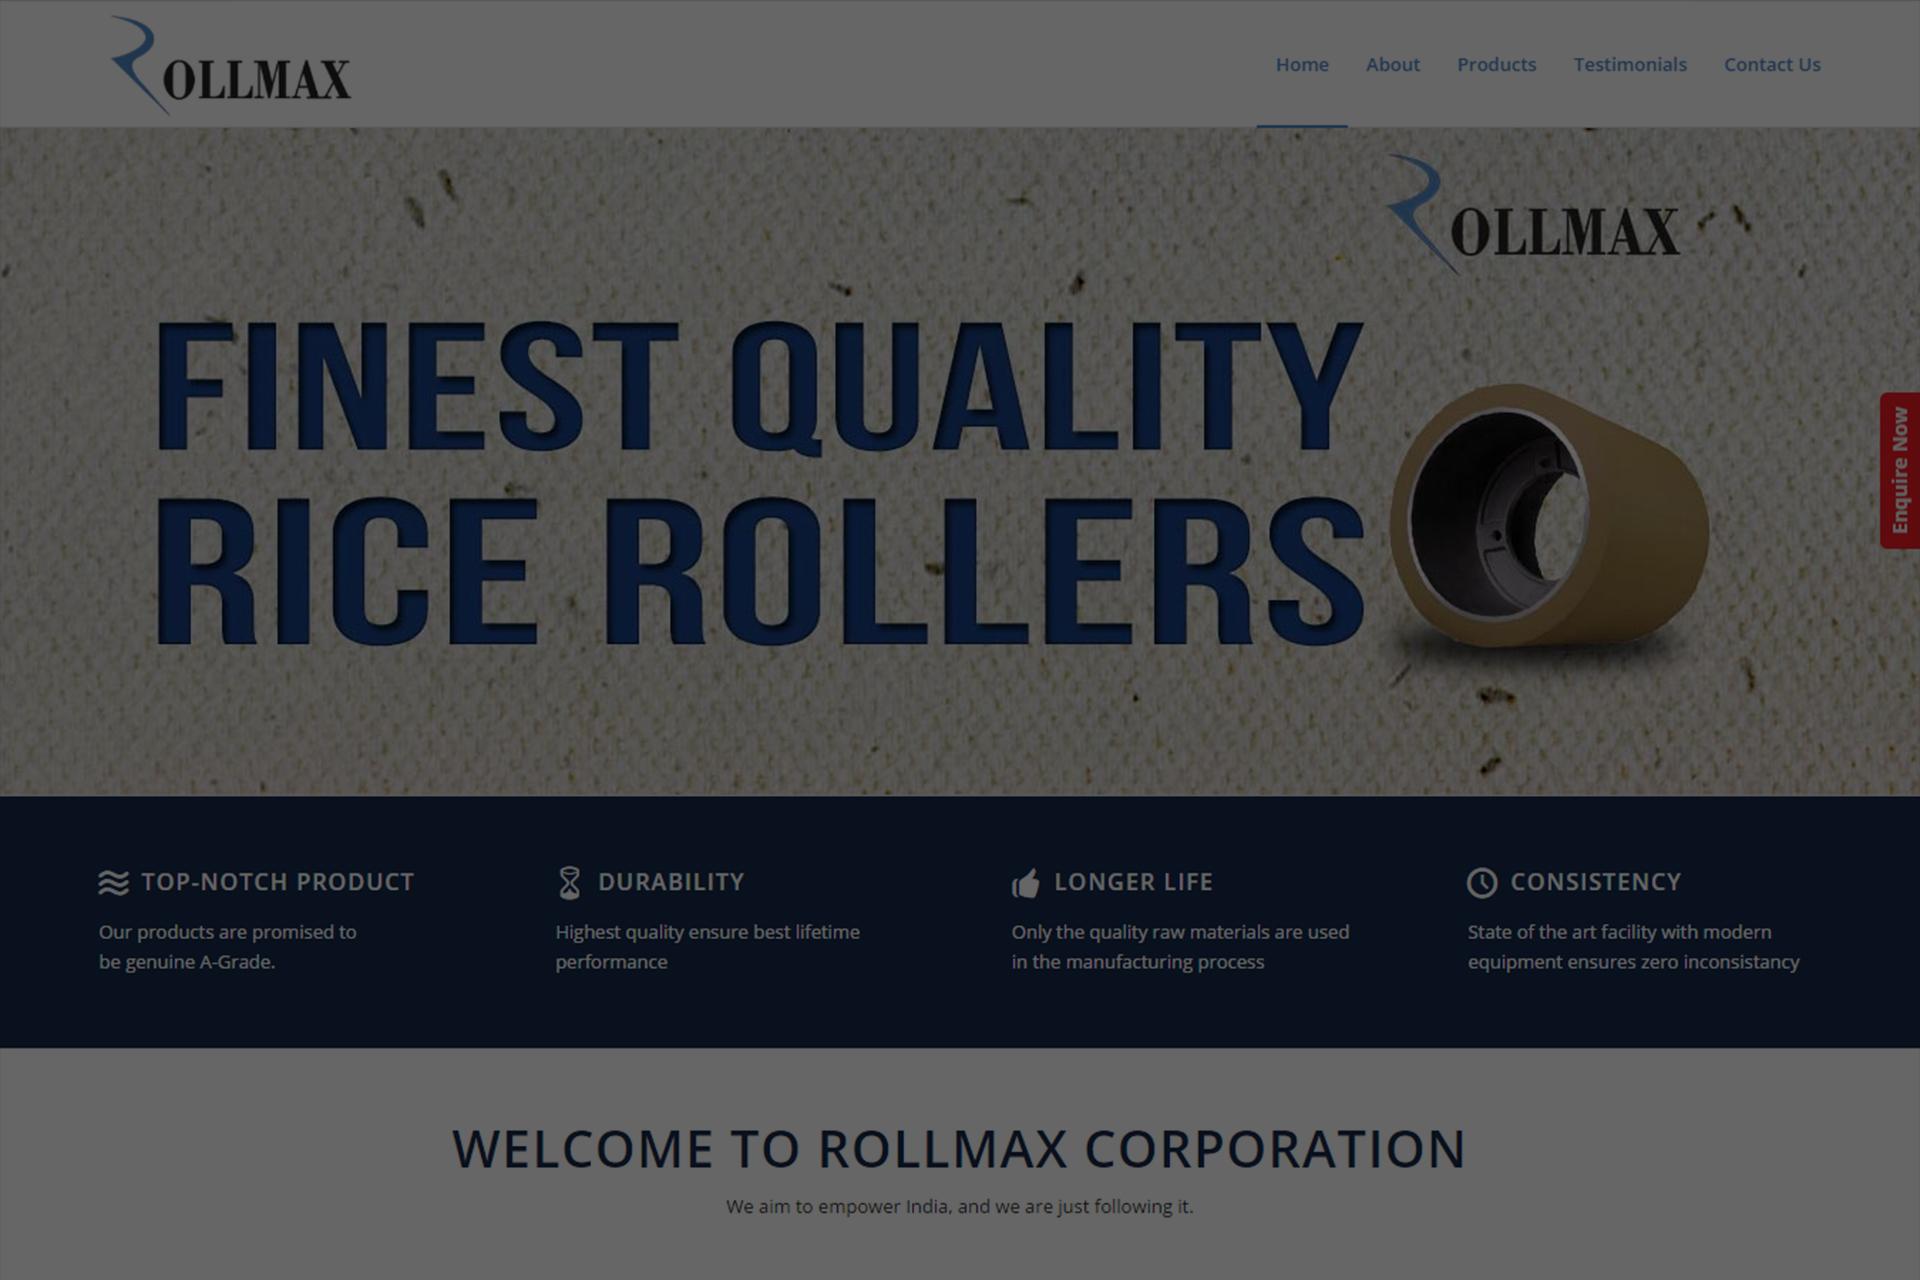 Rollmax Corp